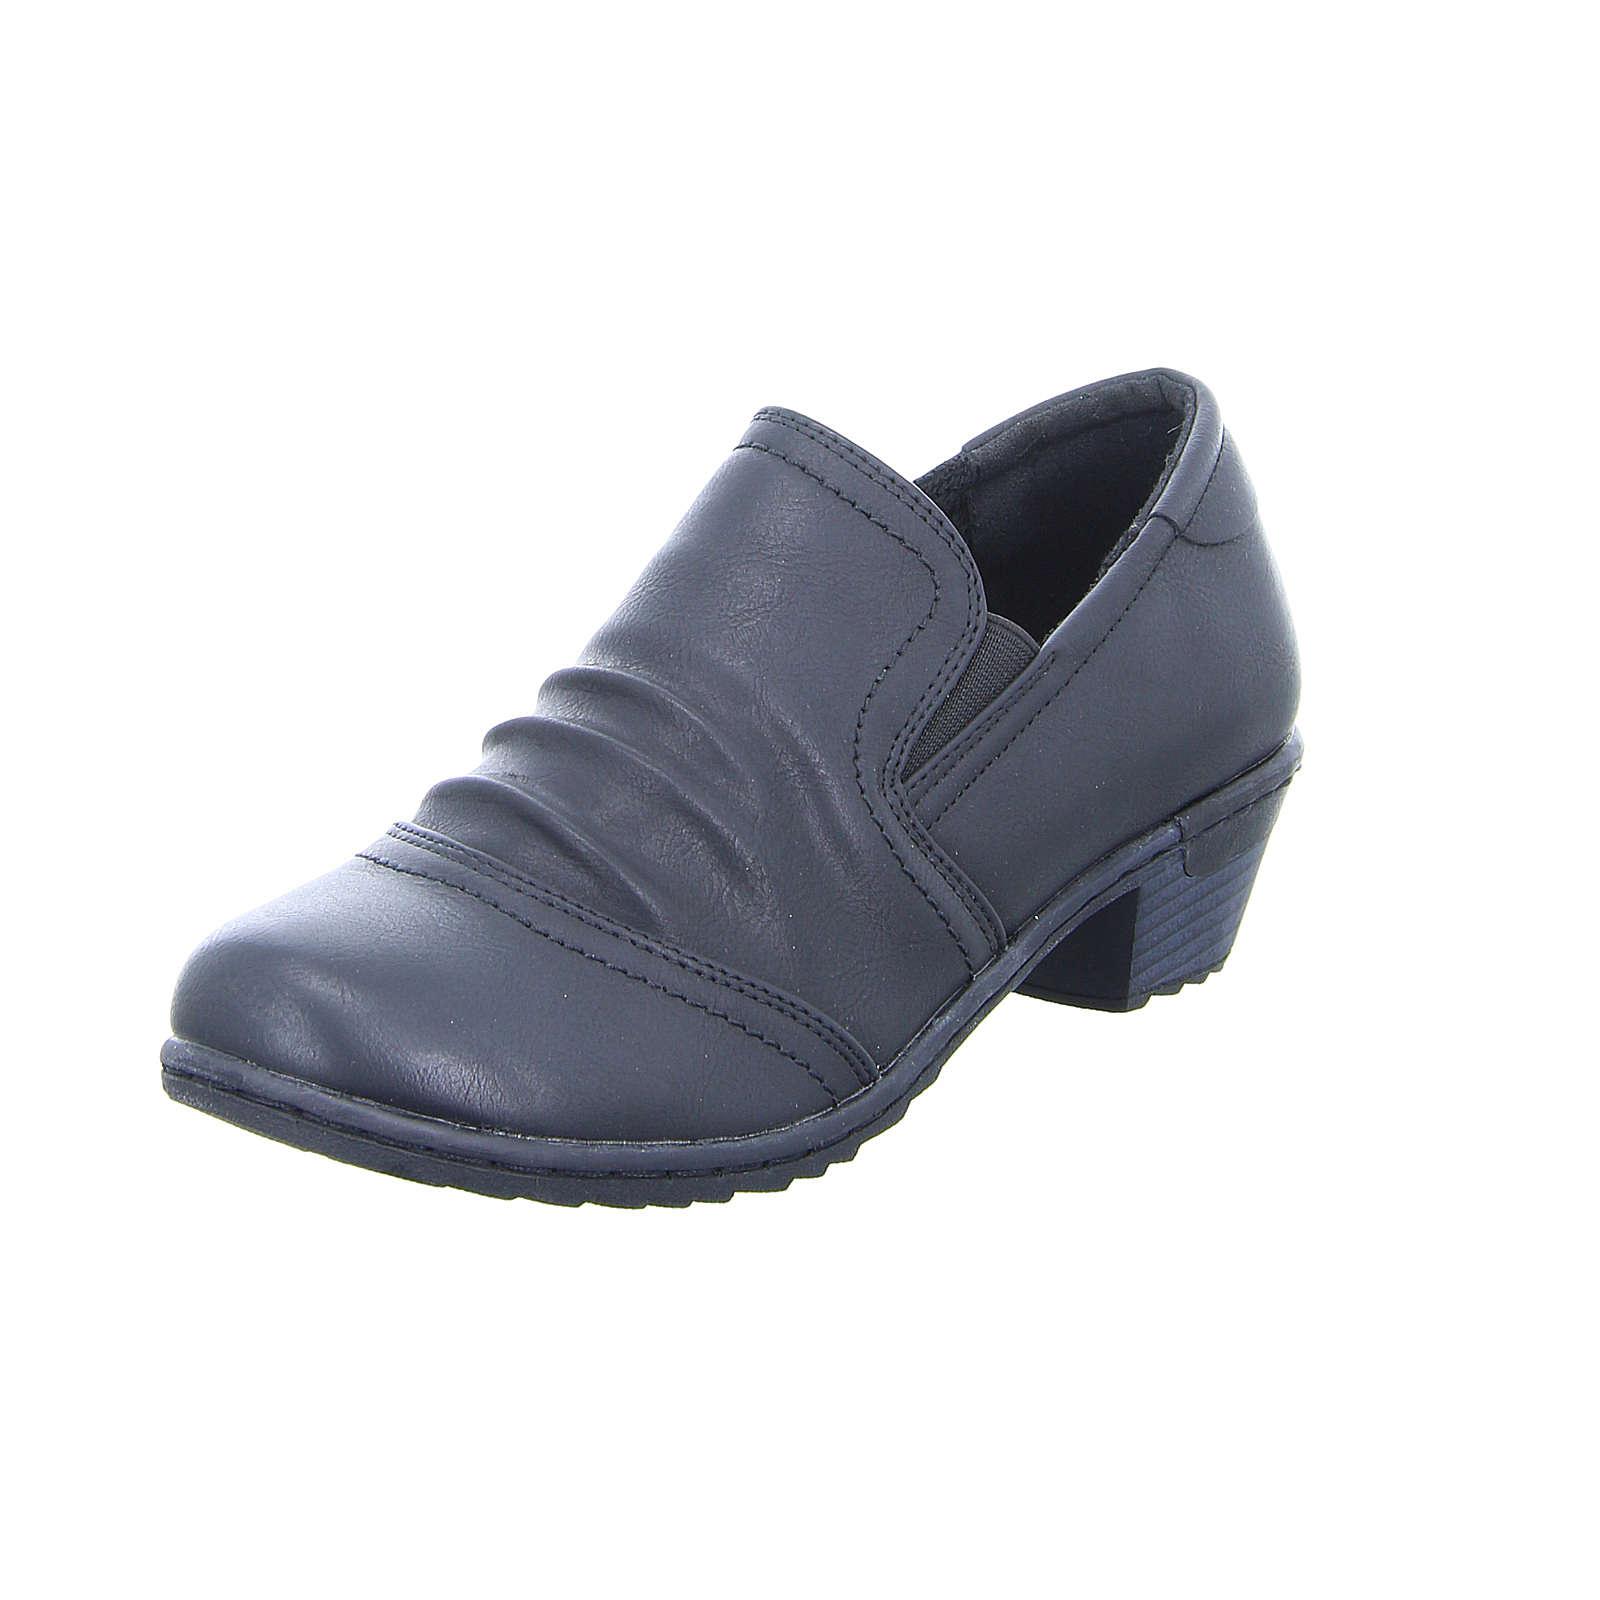 Alyssa Damen Slipper DLY-2-BLK Komfort-Slipper grau Damen Gr. 36